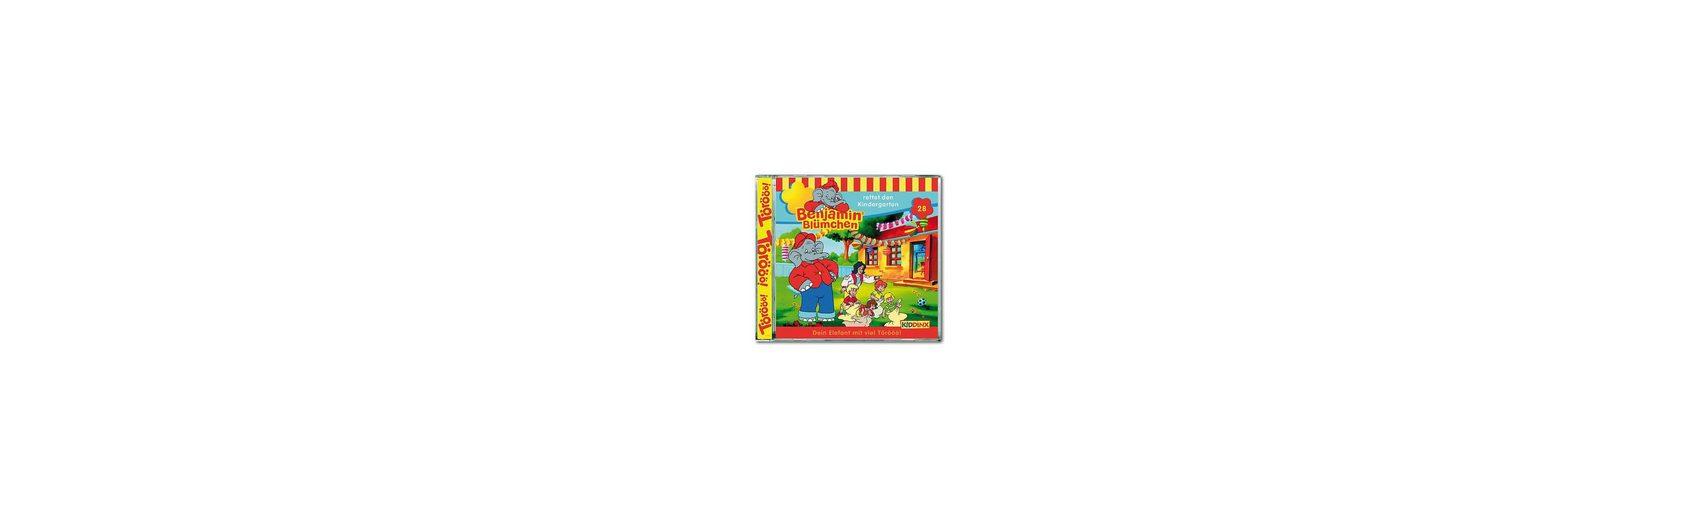 Kiddinx CD Benjamin Blümchen 28 - rettet den Kindergarten